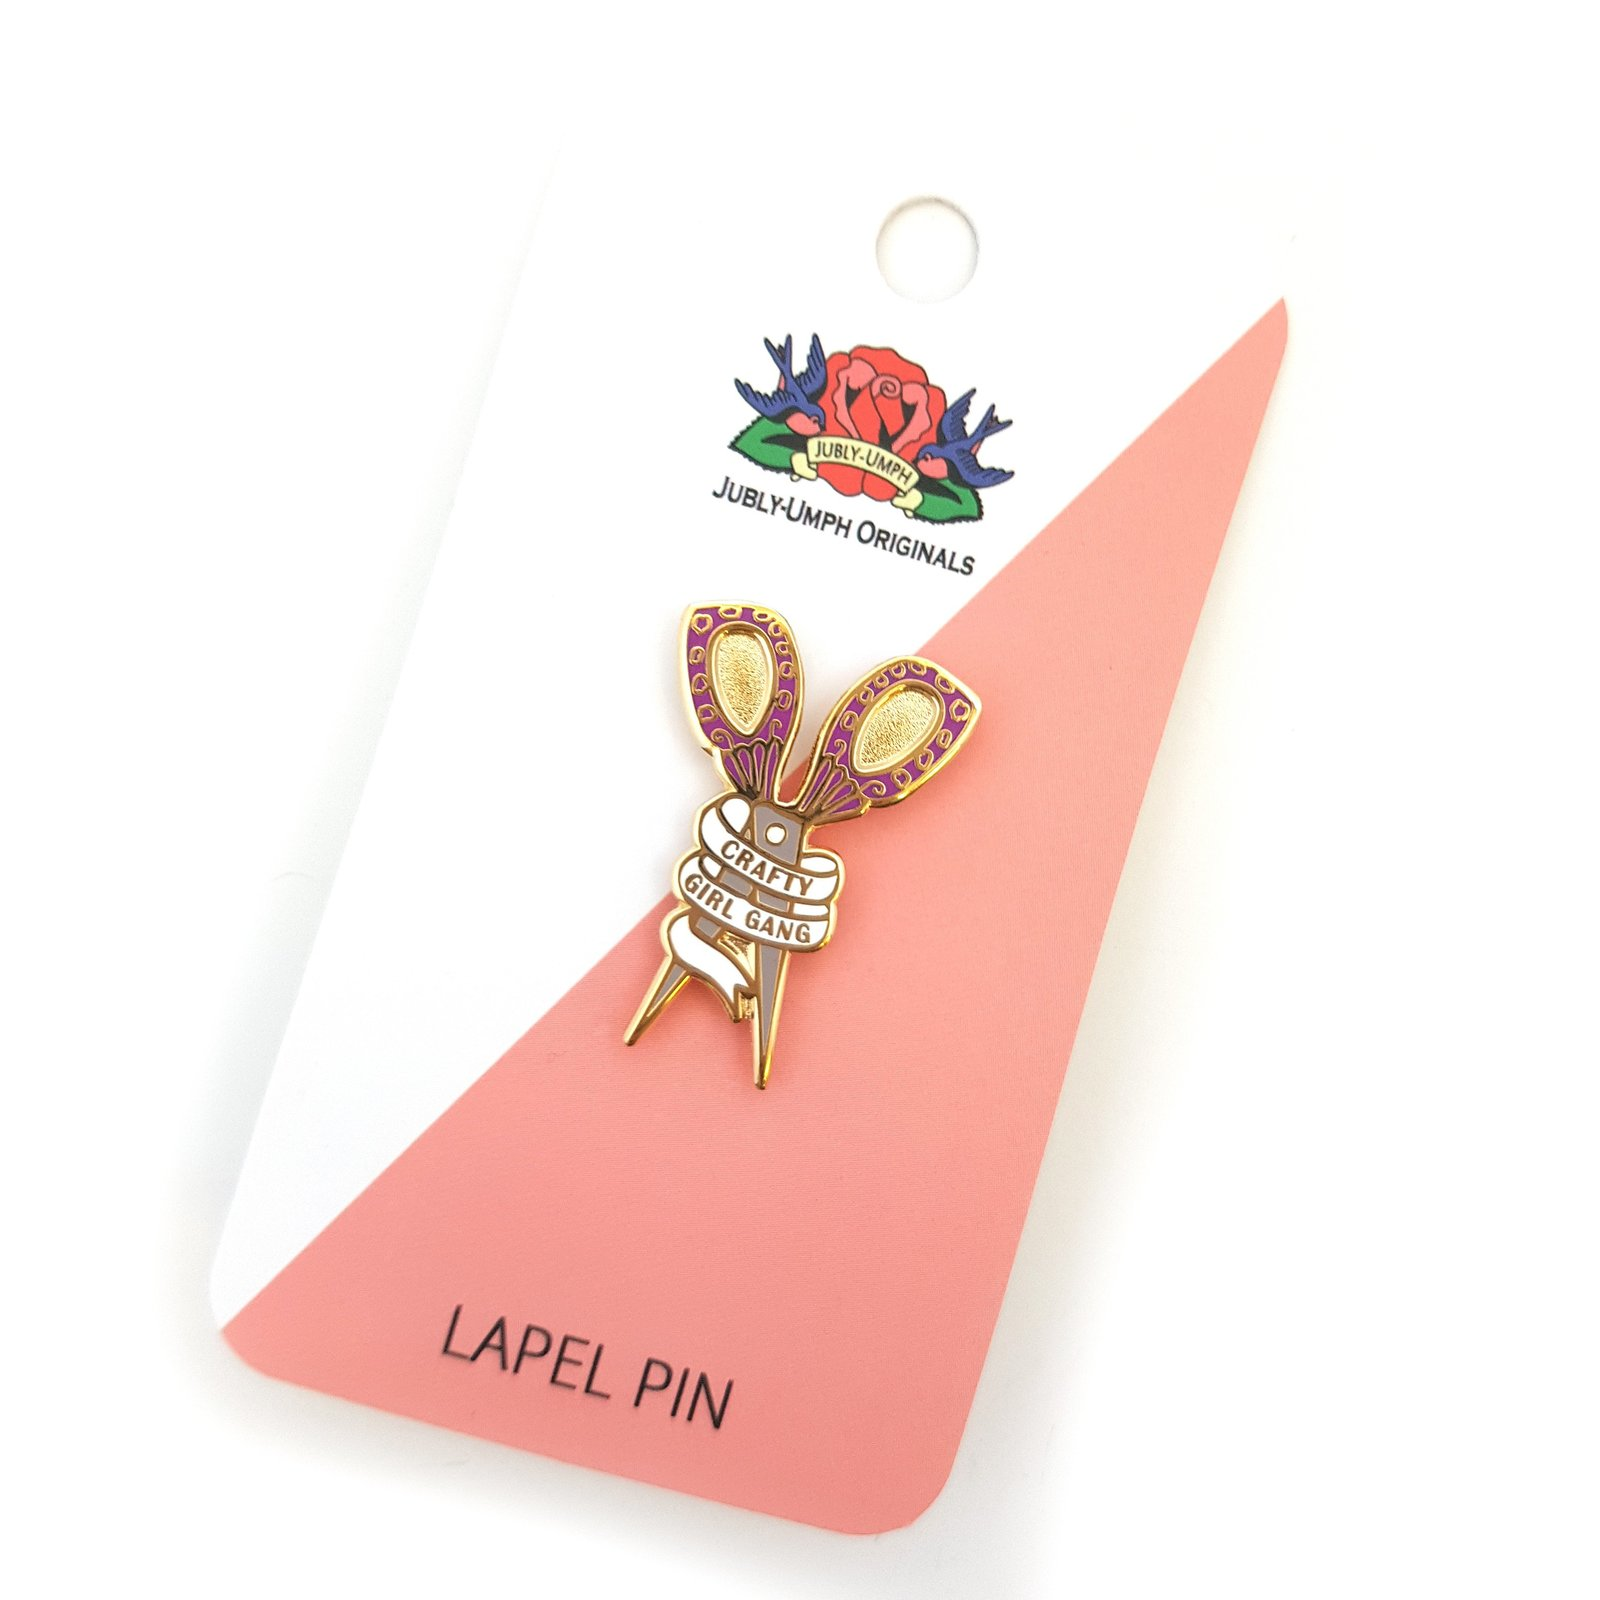 Jubly-Umph Crafty Girl Gang Scissors Lapel Pin (purple) image